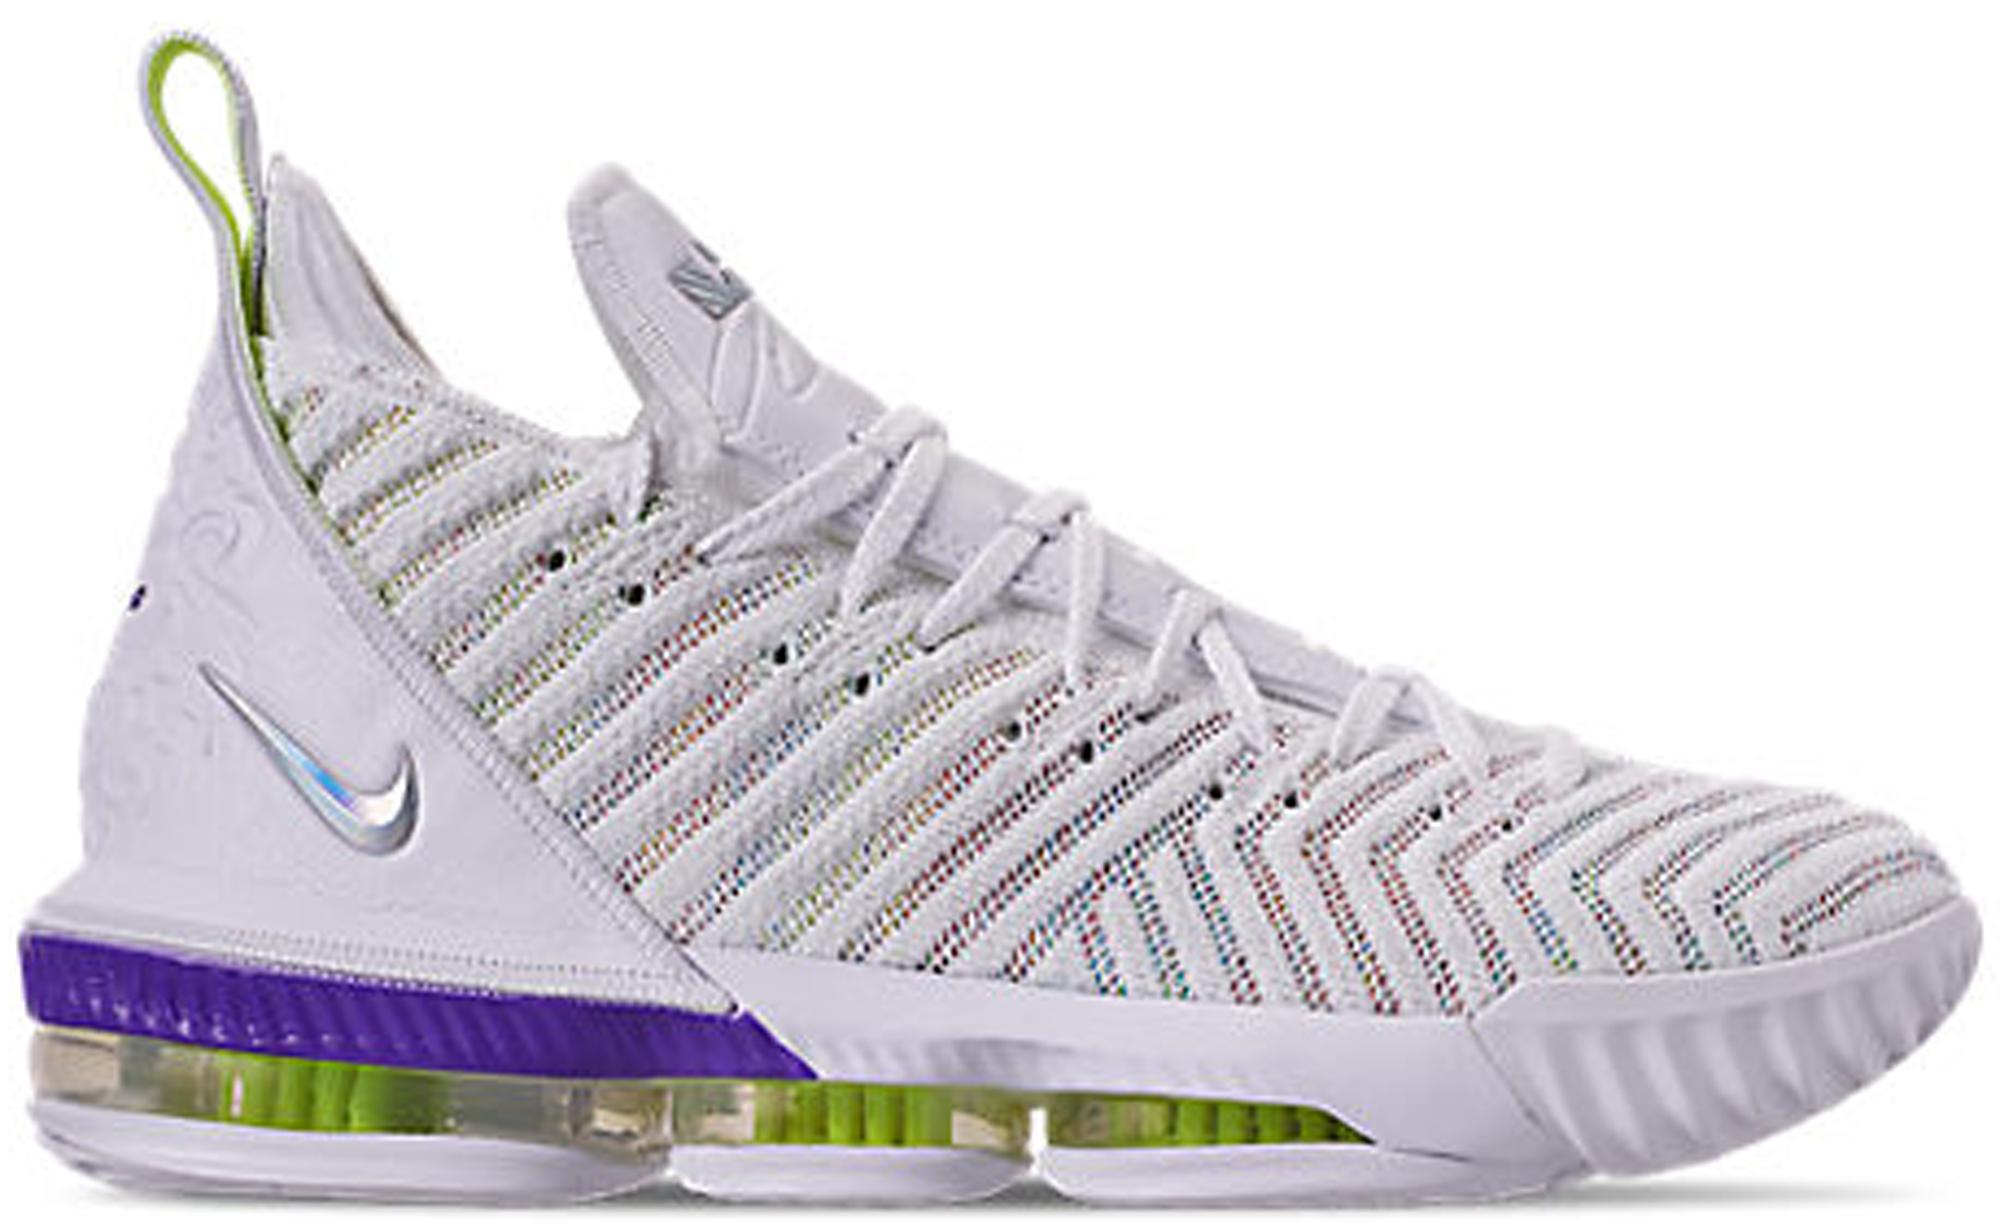 Pre-Owned Nike Lebron 16 Buzz Lightyear